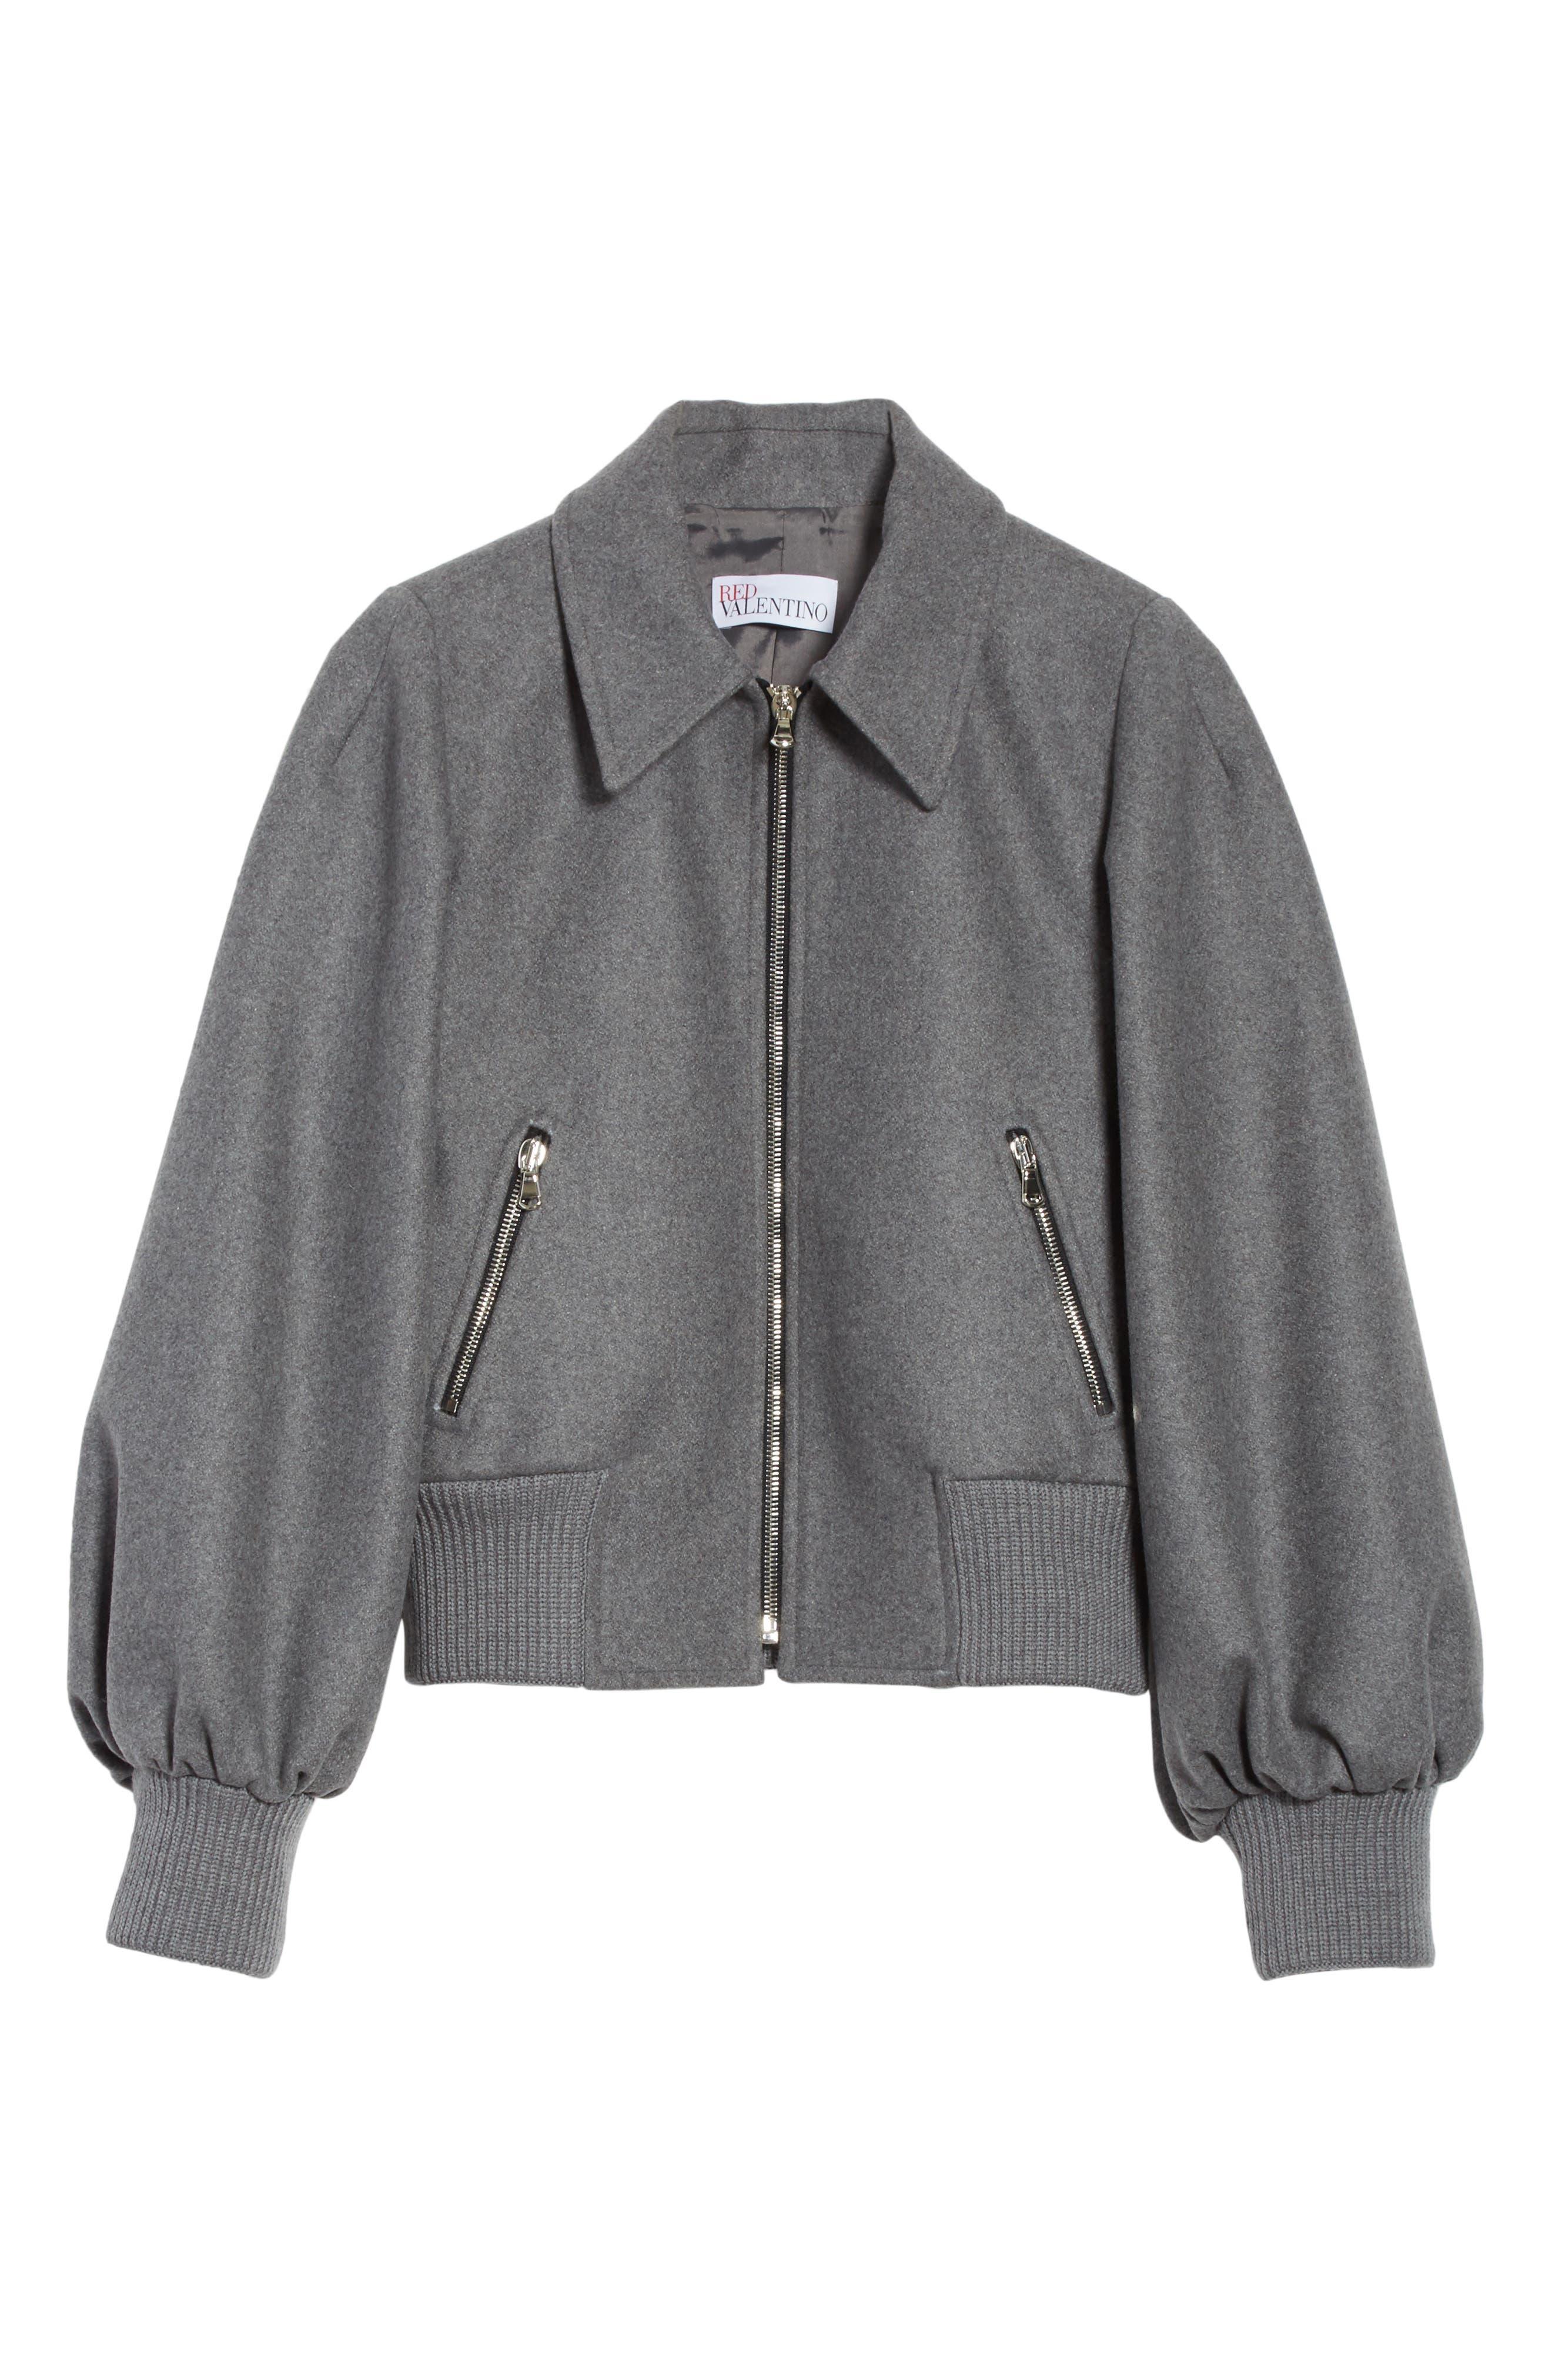 Mélange Wool Blend Jacket,                             Alternate thumbnail 5, color,                             026